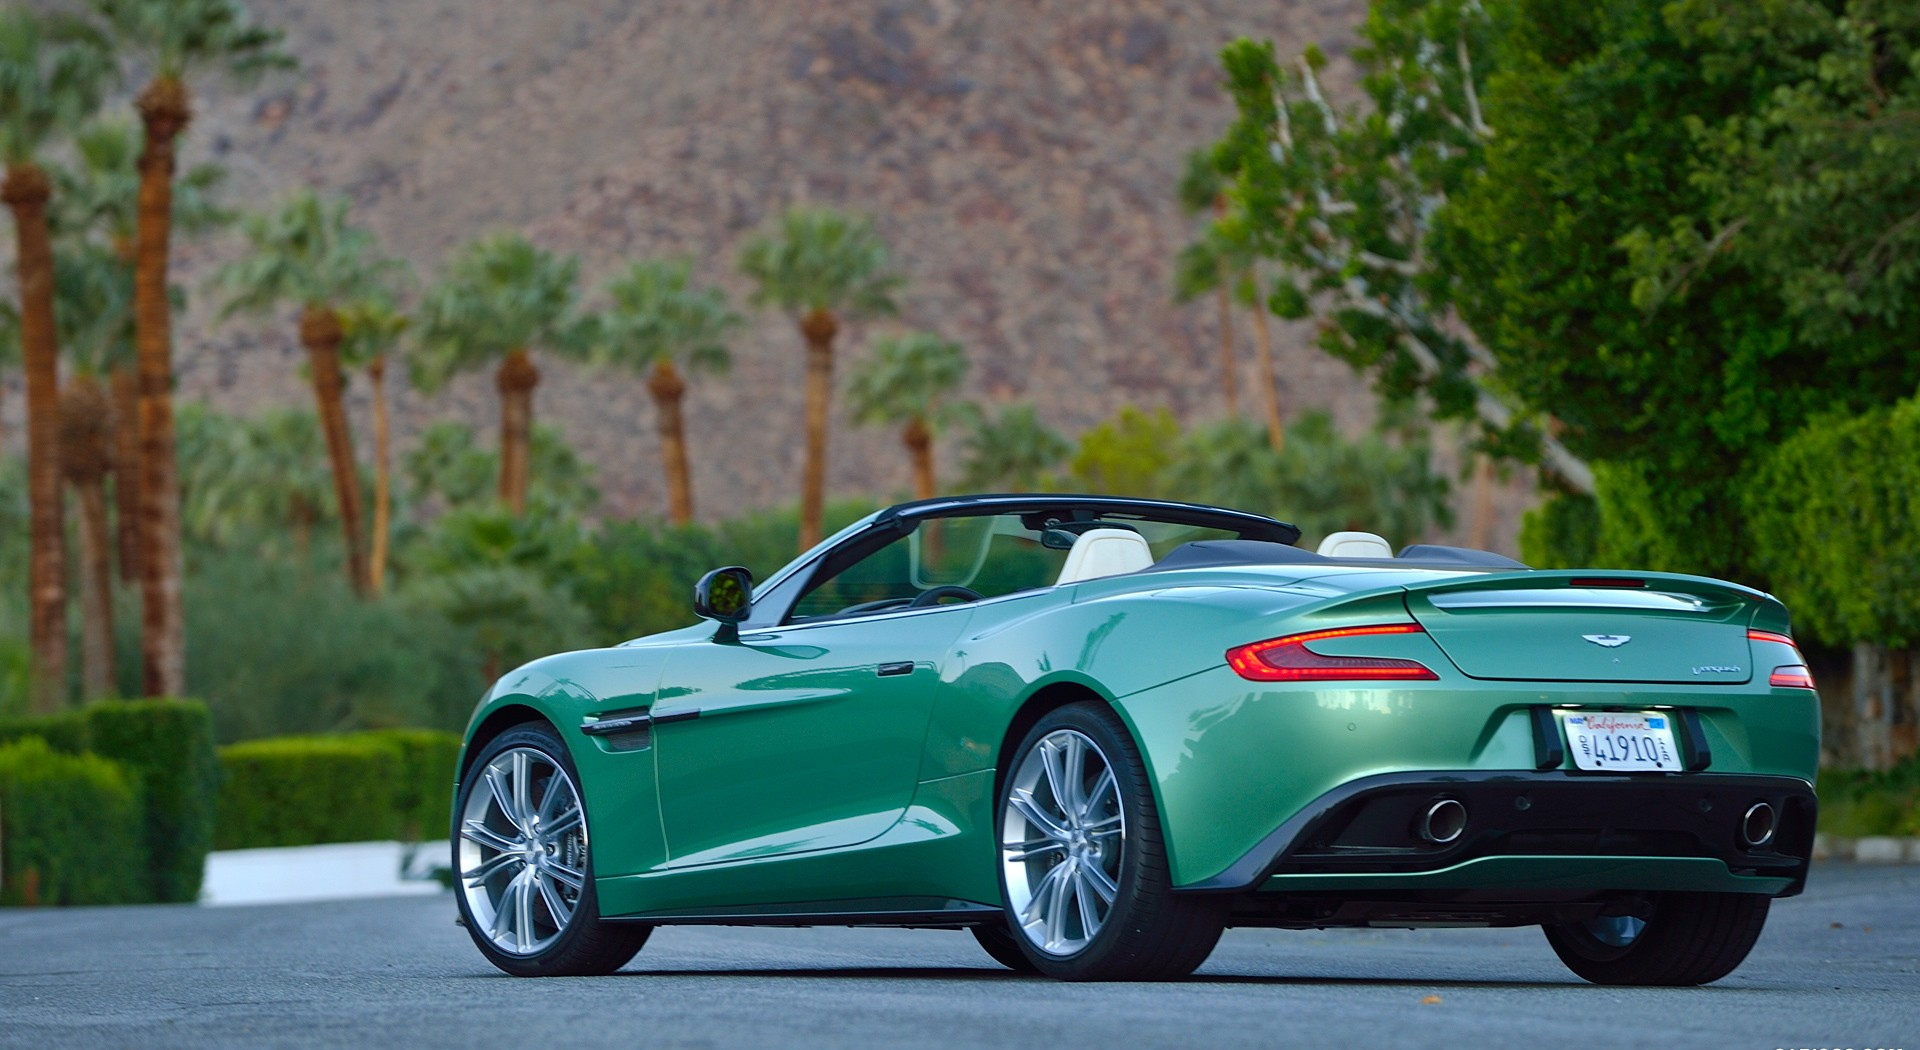 Aston Martin Vanquish Wallpapers green